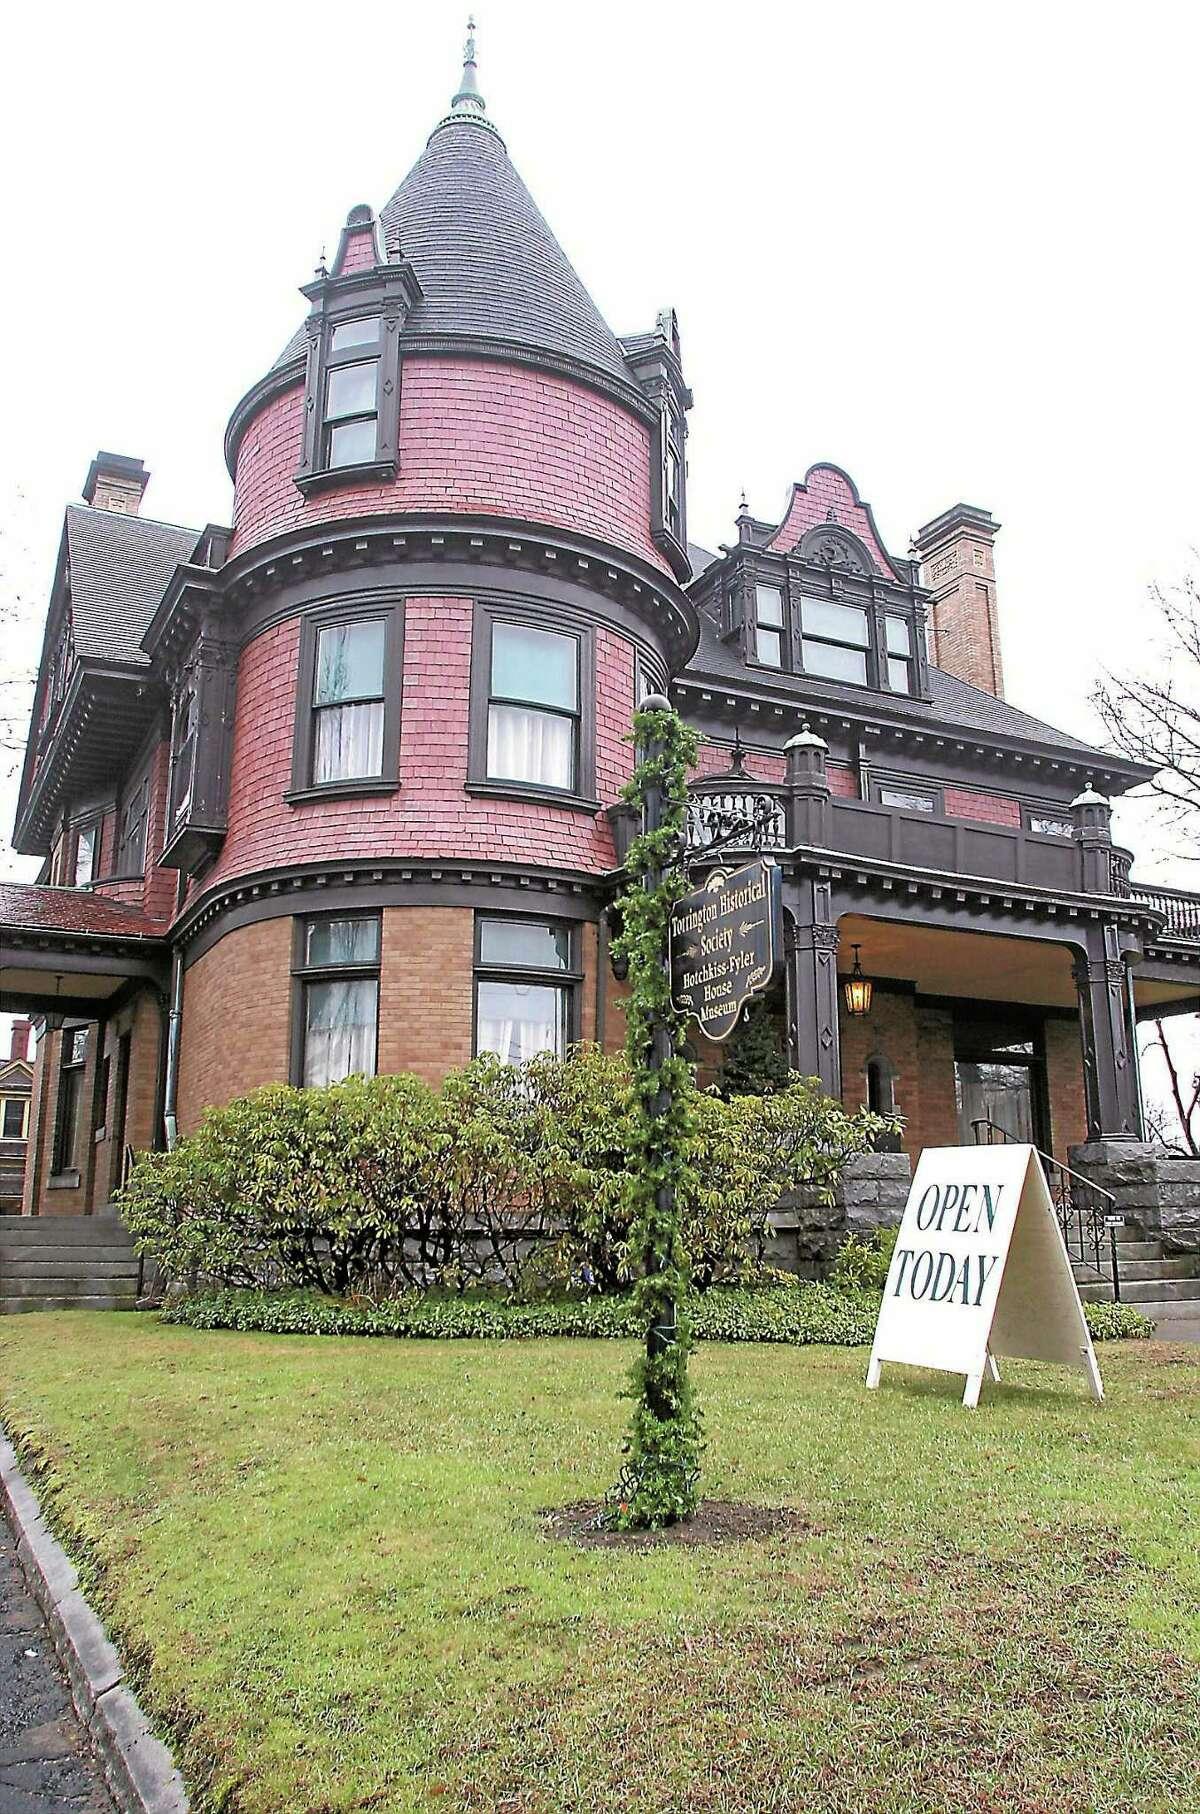 The Hotchkiss-Fyler house.